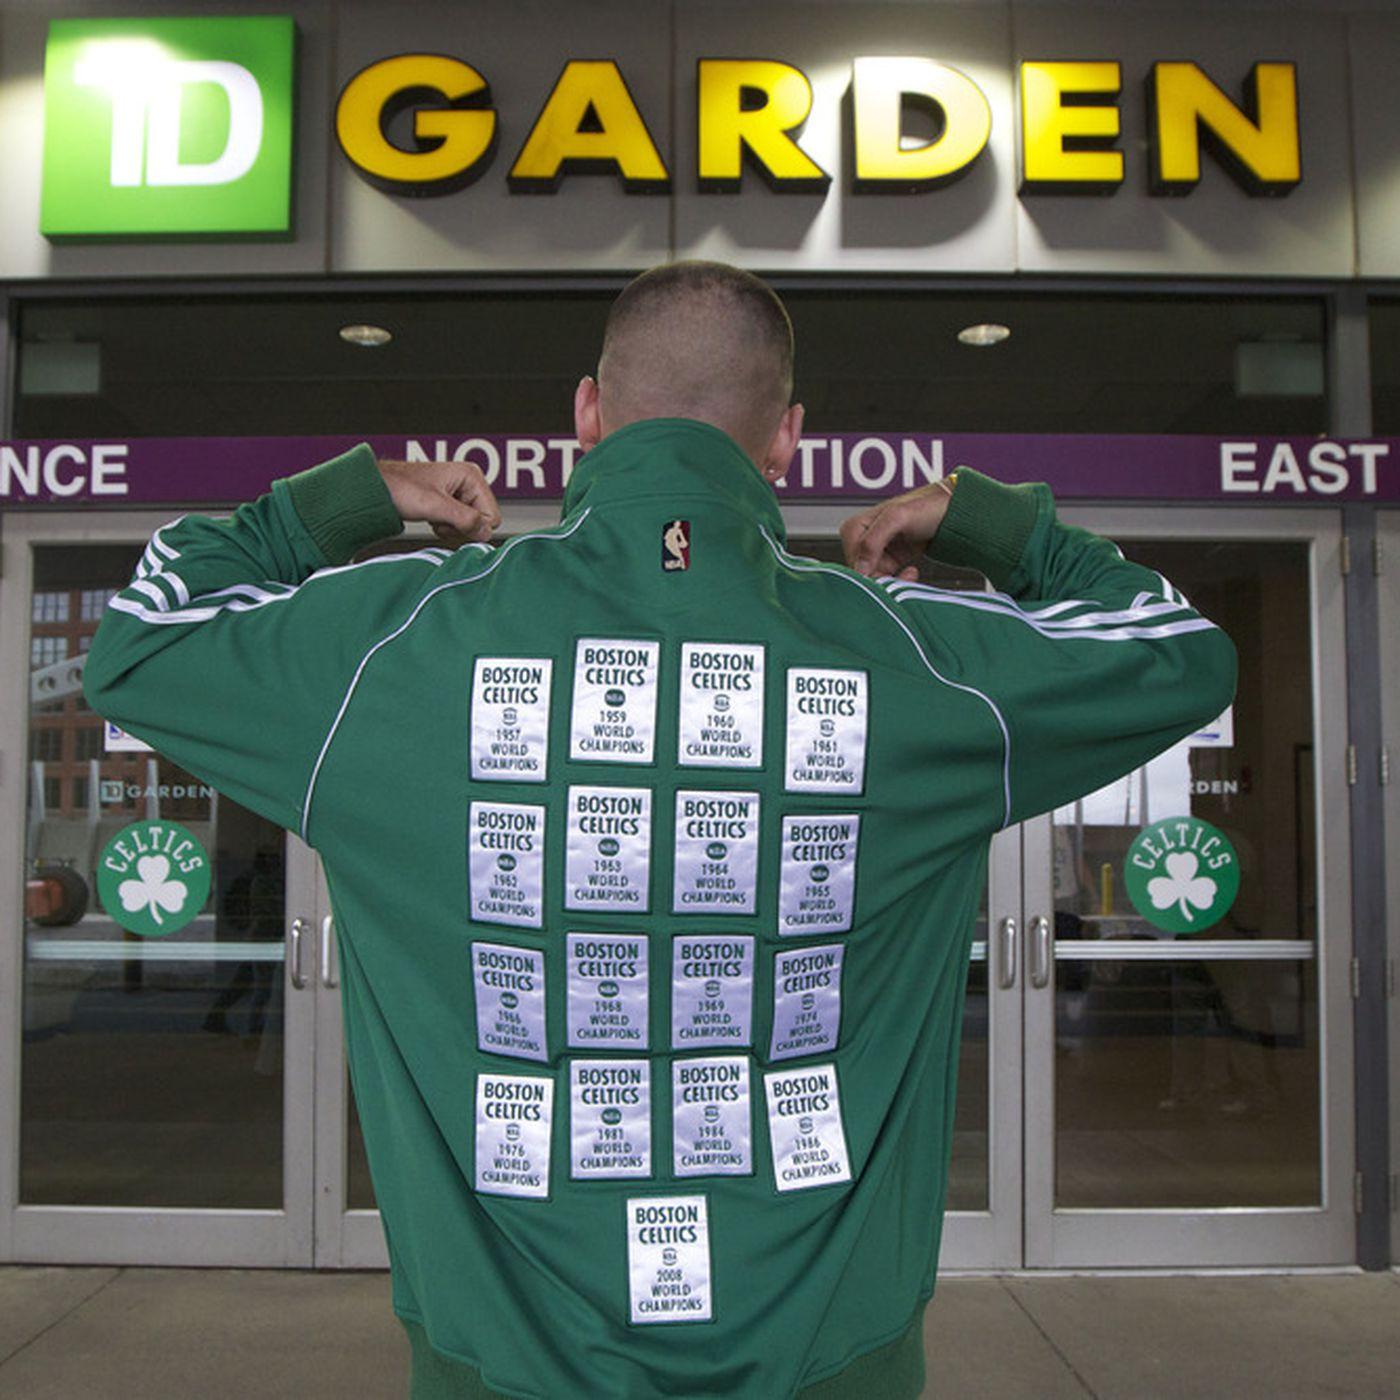 d8be8b24b7e Boston Celtics 2008 Championship T Shirt – EDGE Engineering and ...